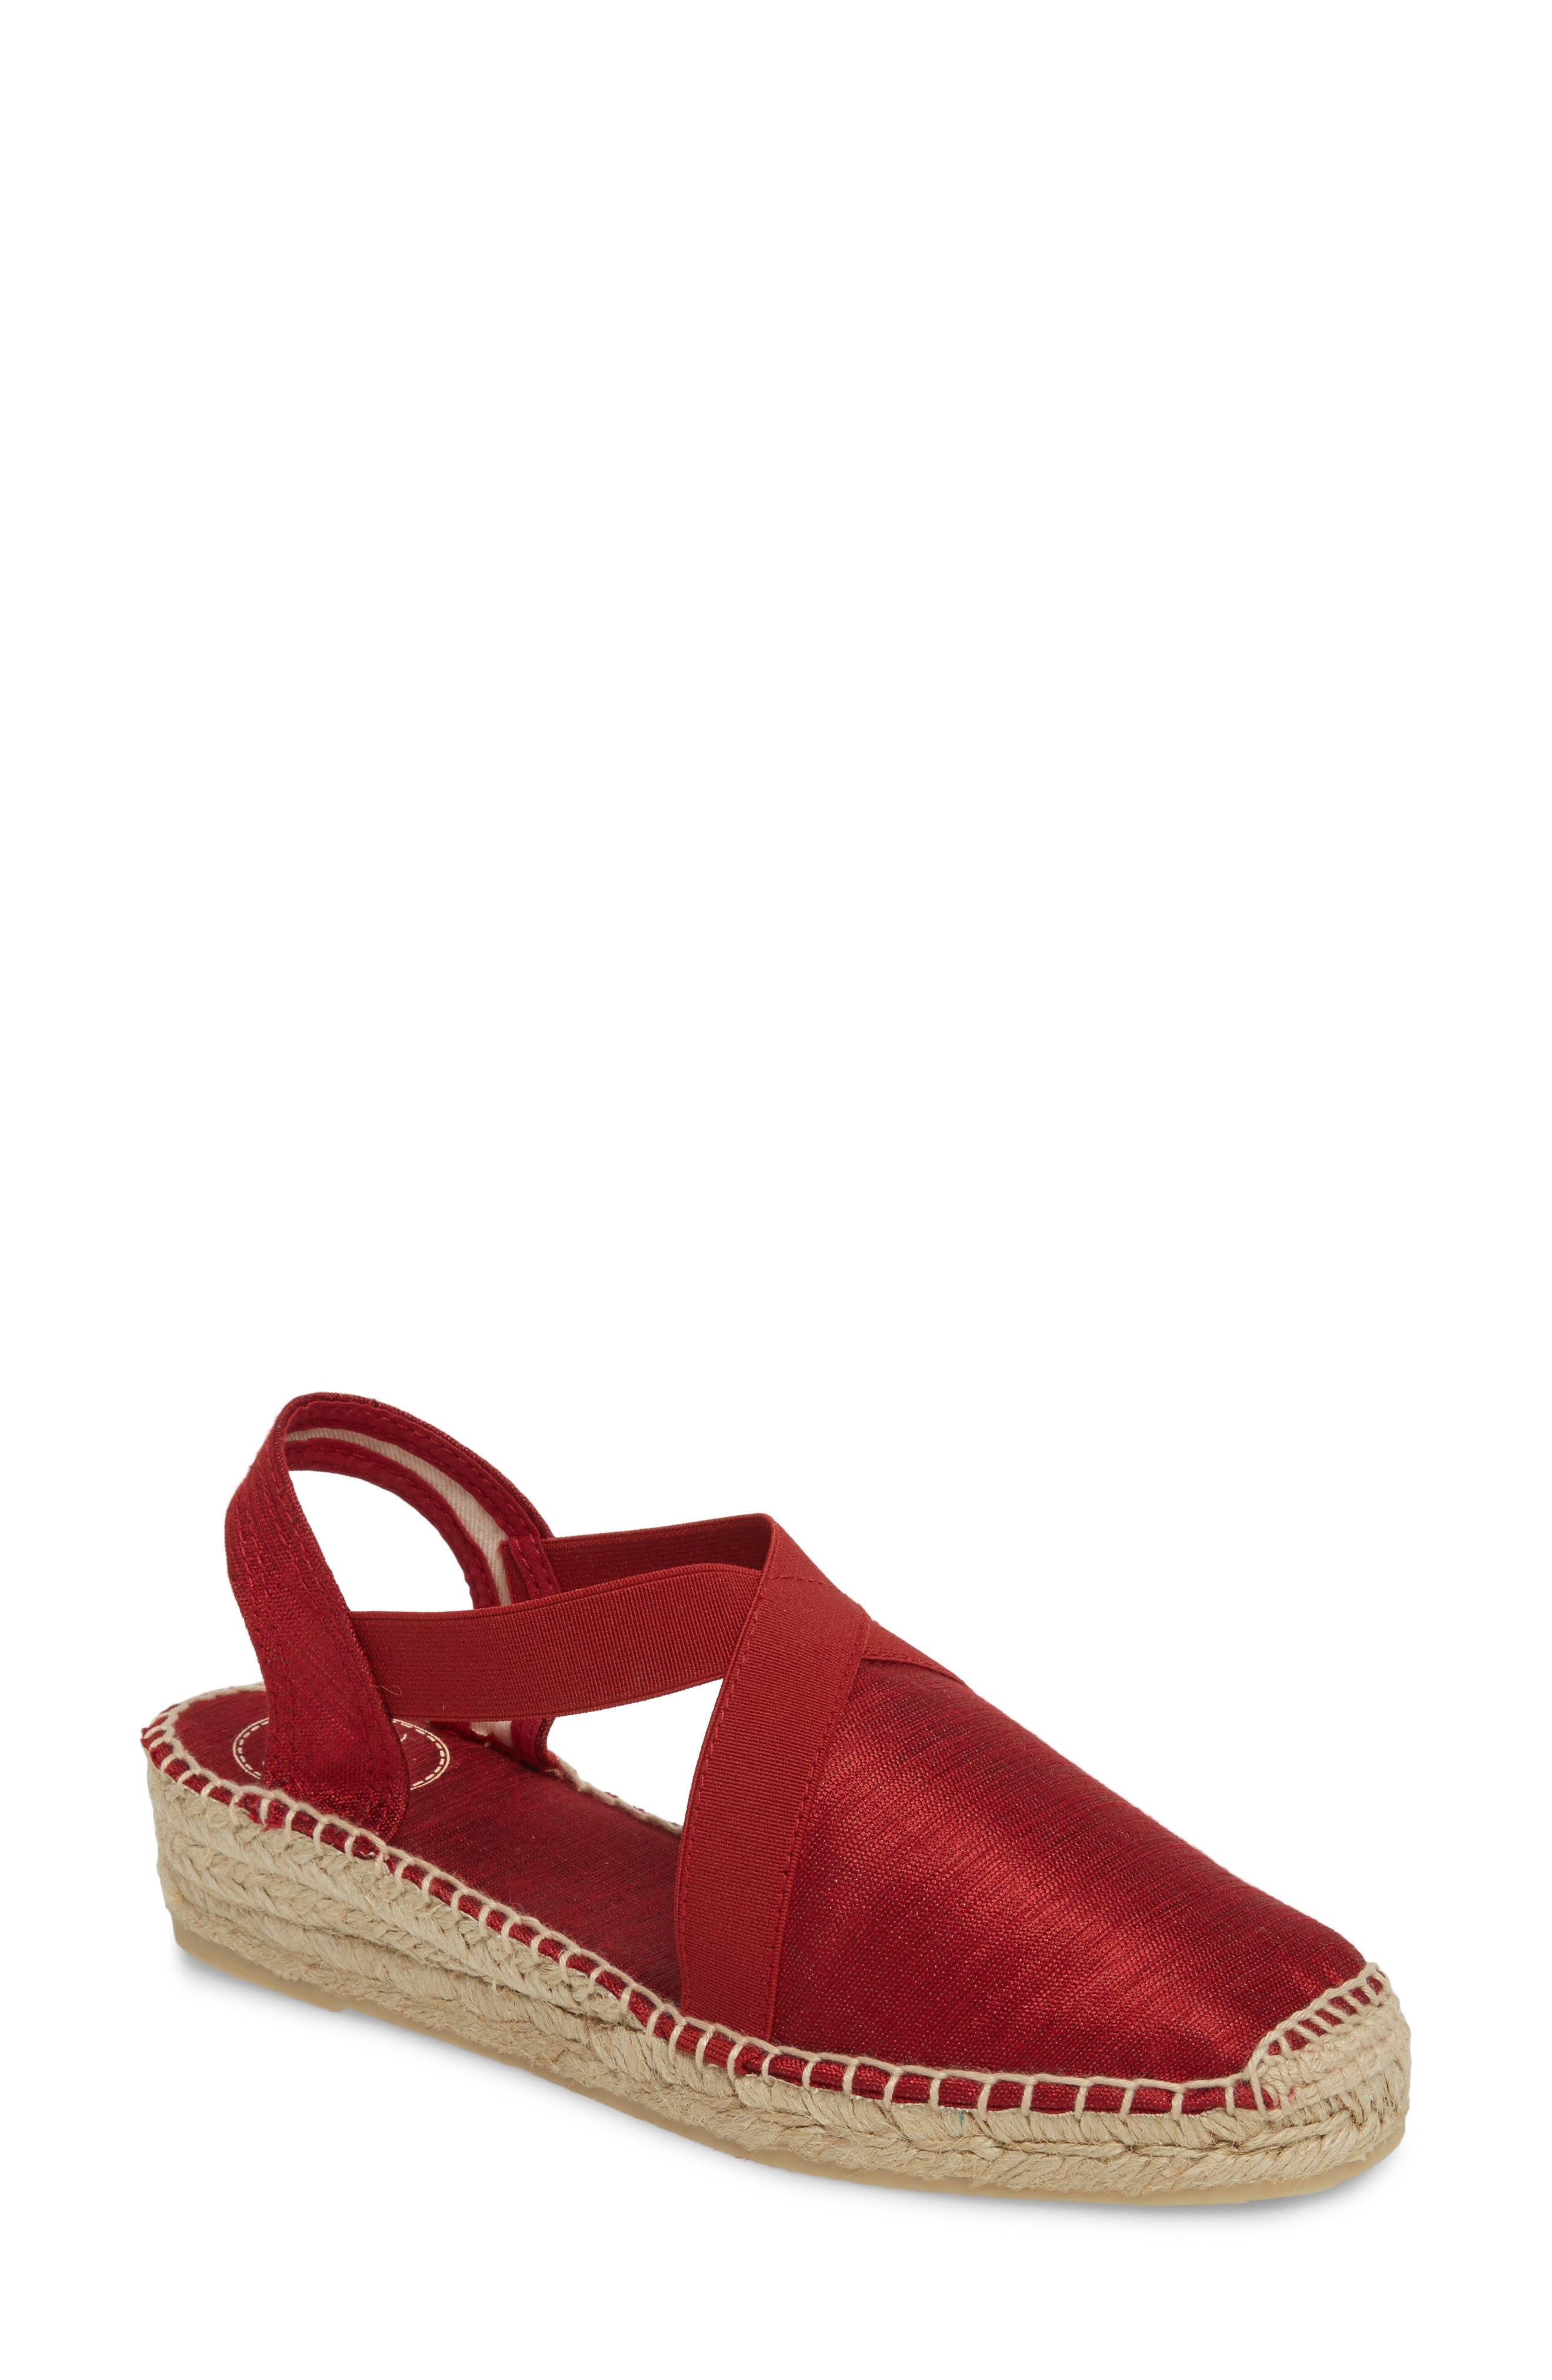 'Vic' Espadrille Slingback Sandal,                             Main thumbnail 1, color,                             Red Fabric